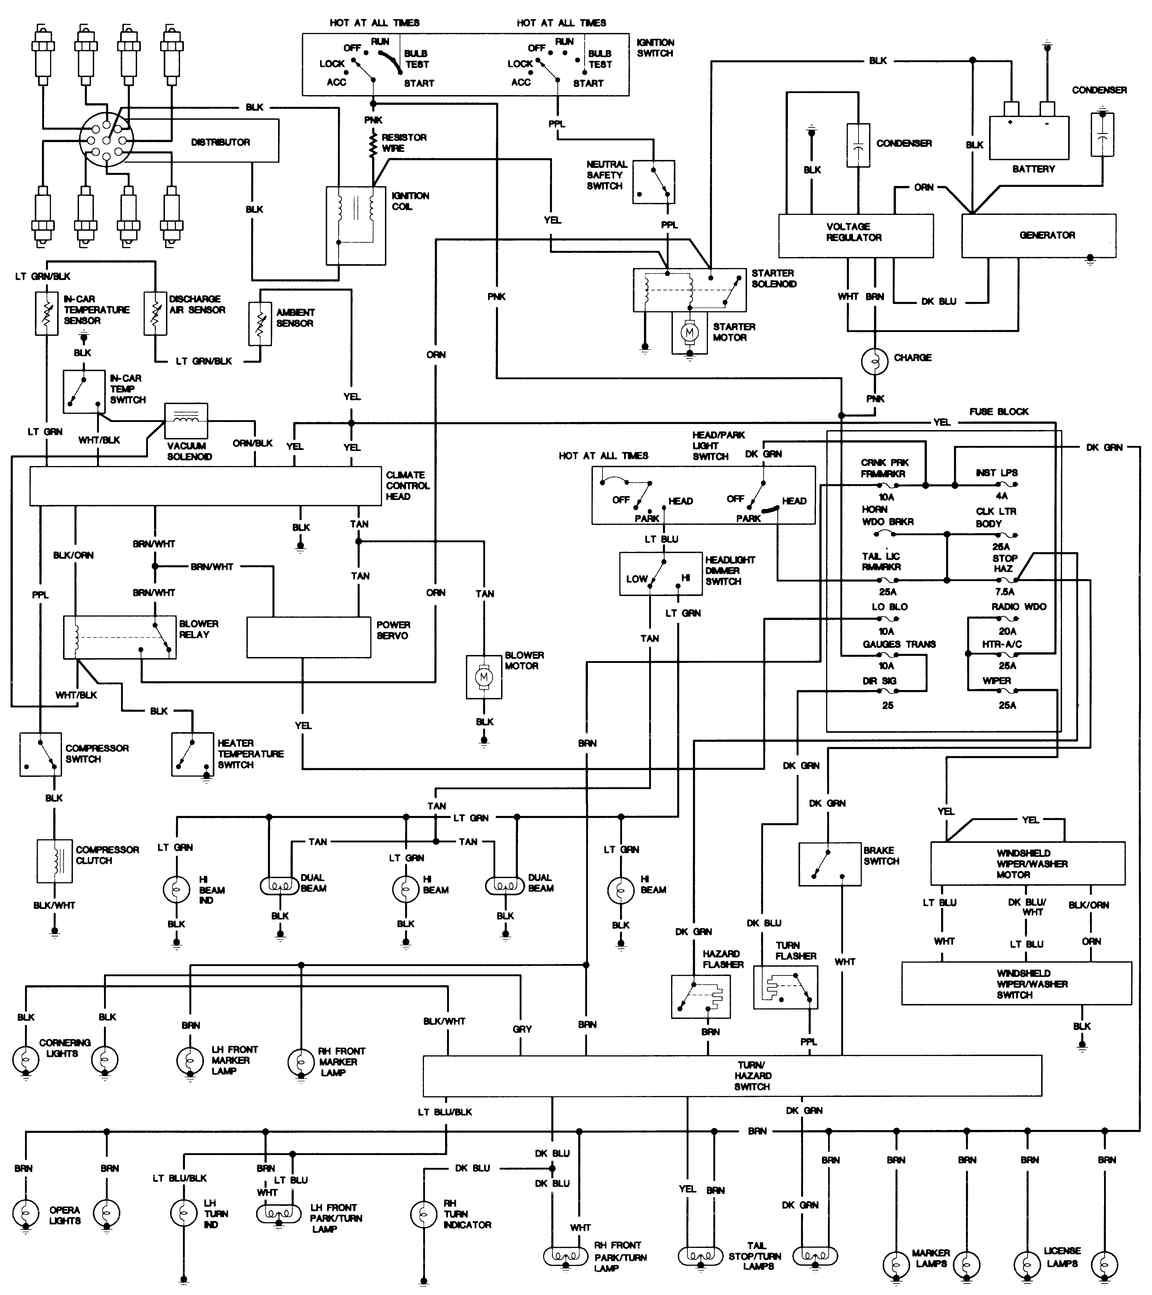 1970 Cadillac Wiring Diagram Wiring Diagram Academic Academic Lastanzadeltempo It